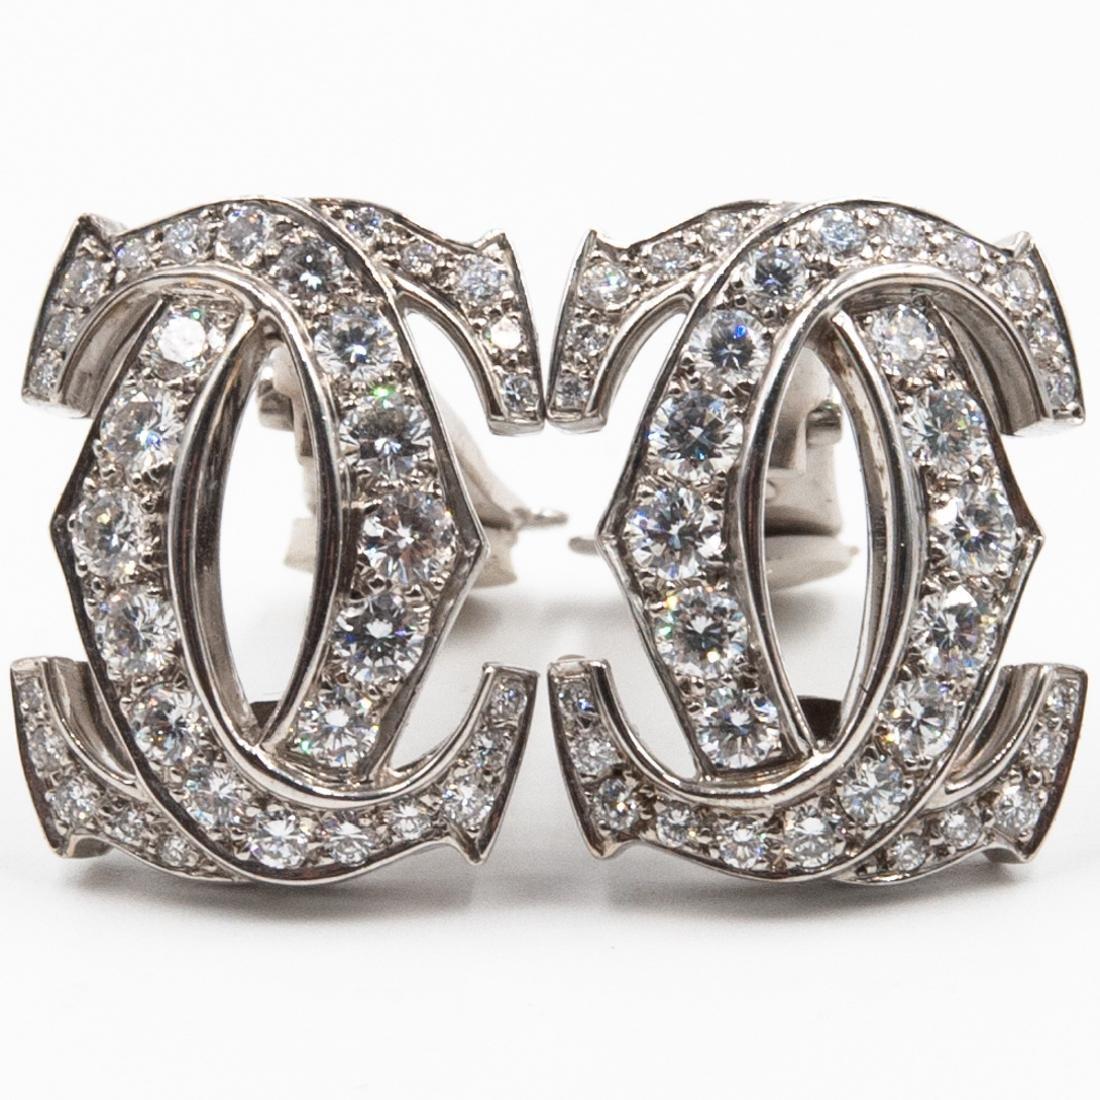 Pair of 18K Cartier C de Cartier Diamond Earrings